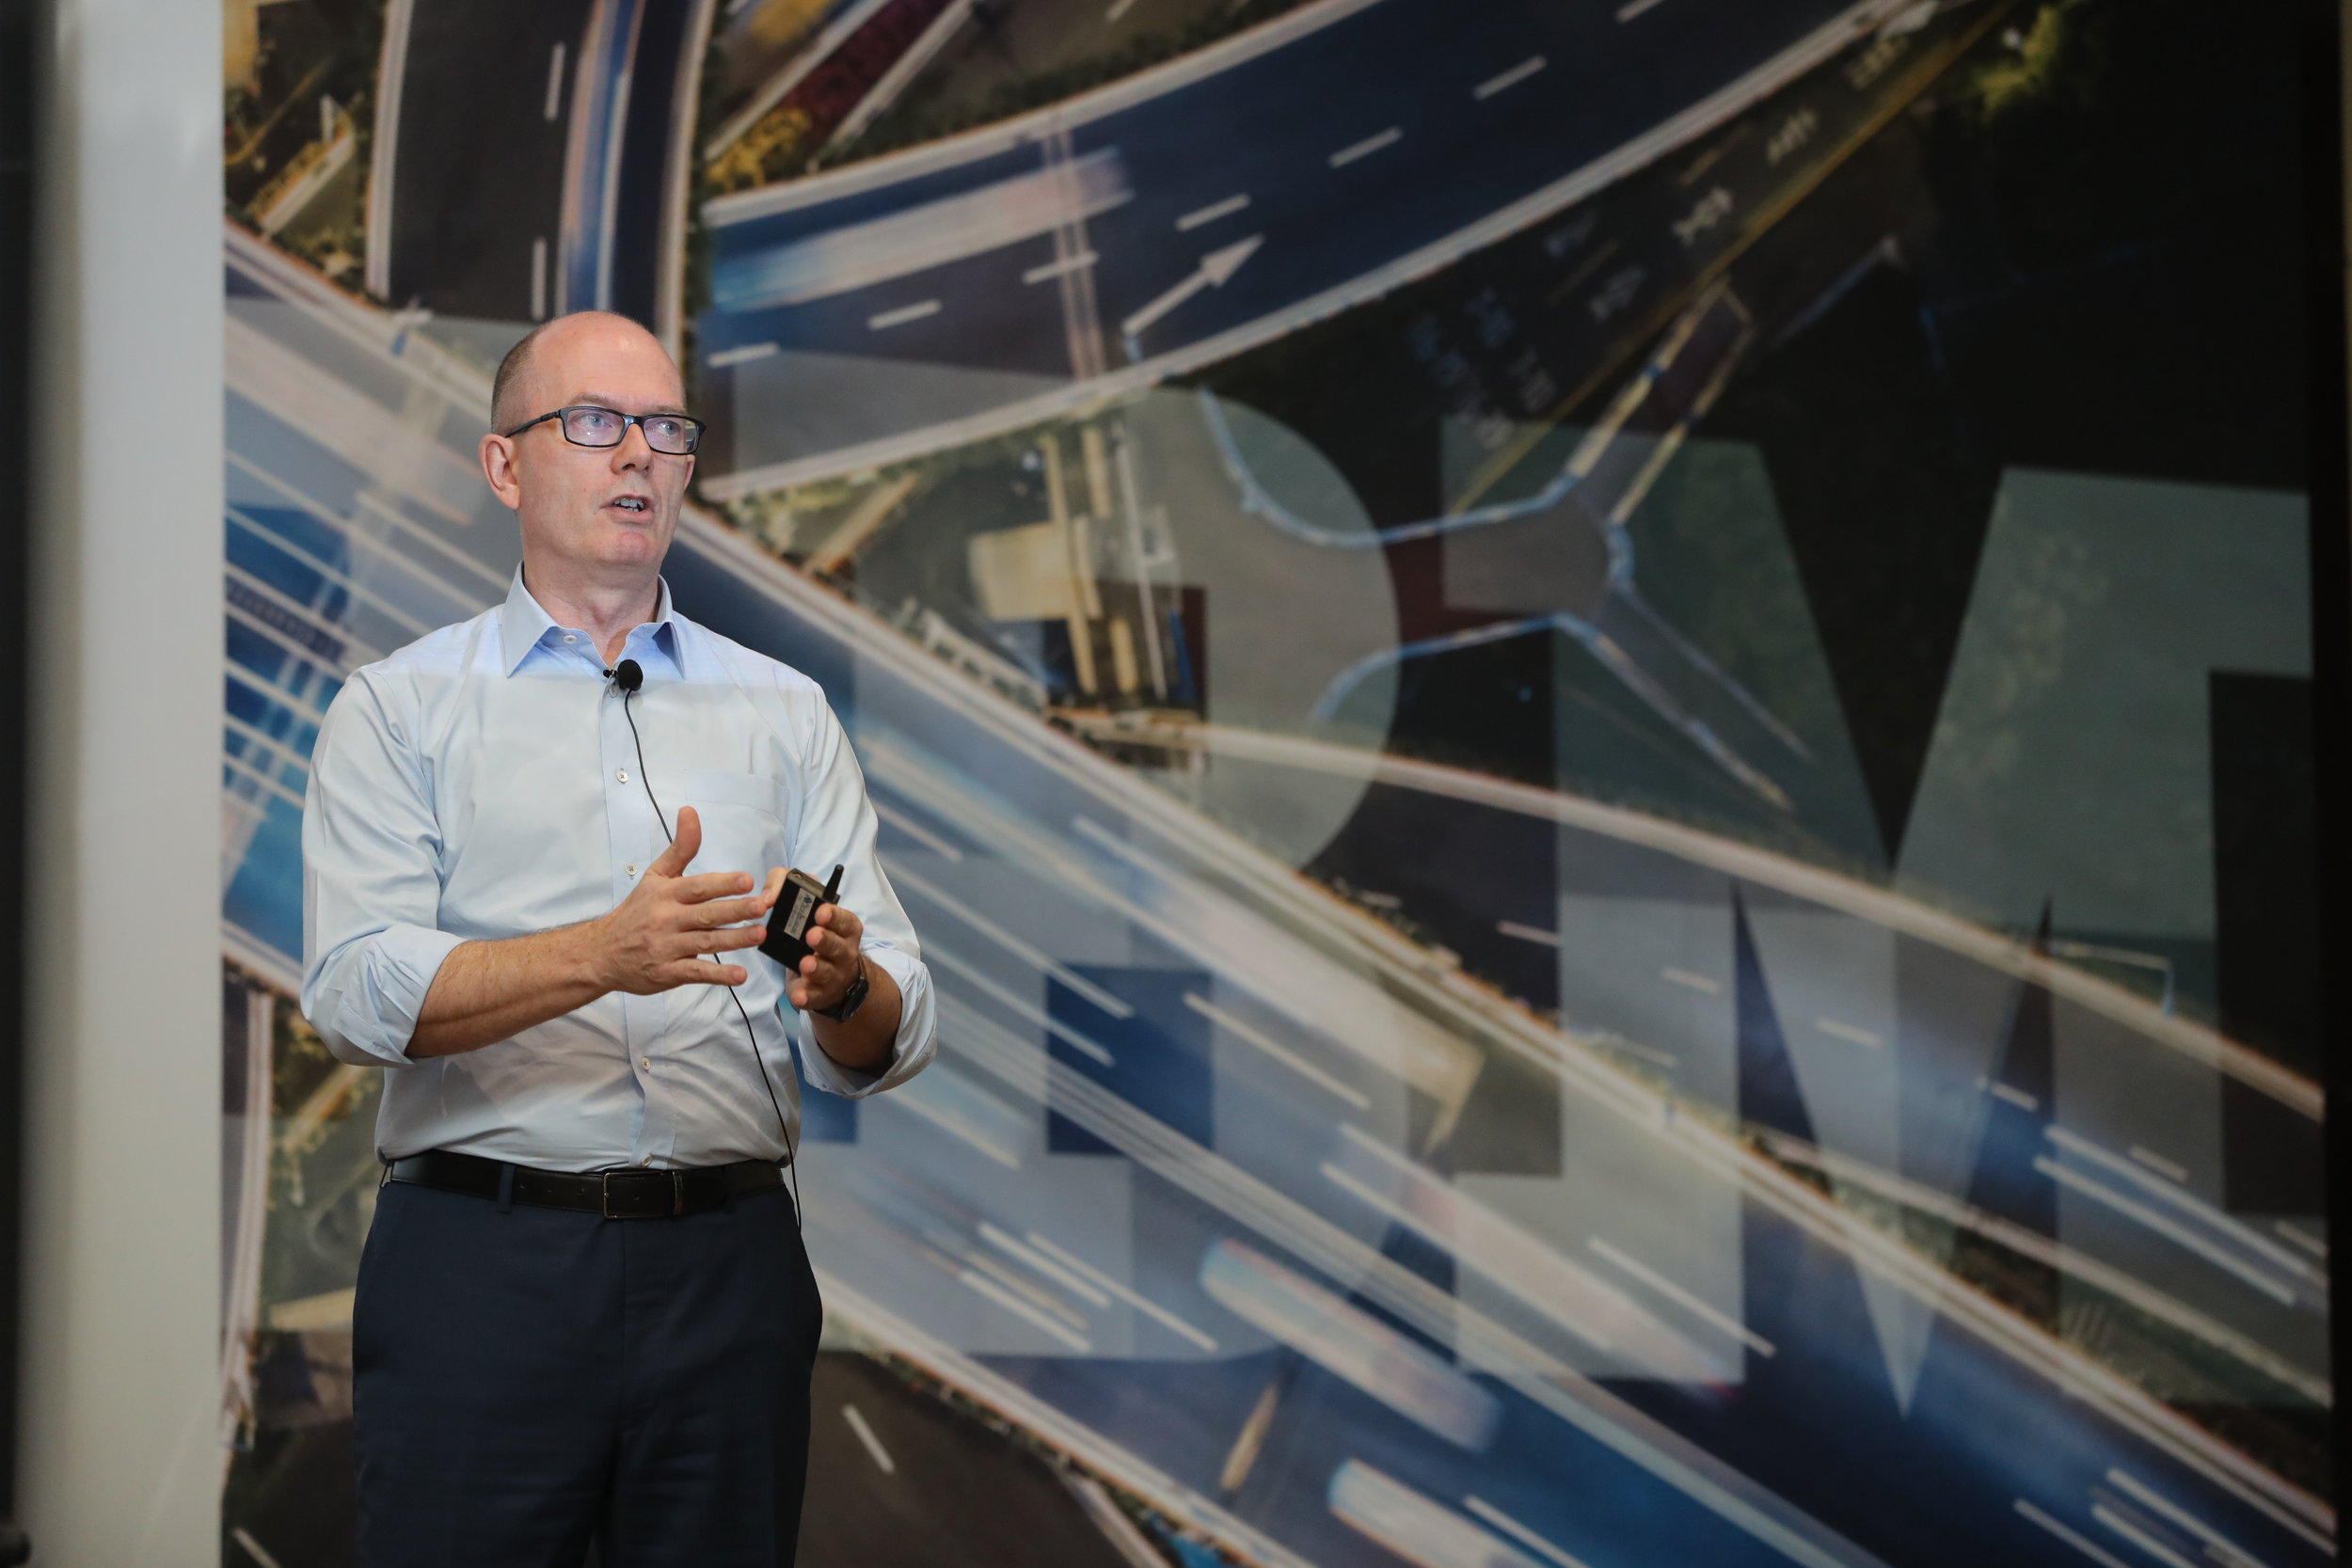 Jonathan Paul at an IBM Power9 Launch held in Kuala Lumpur on 15 May 2018.